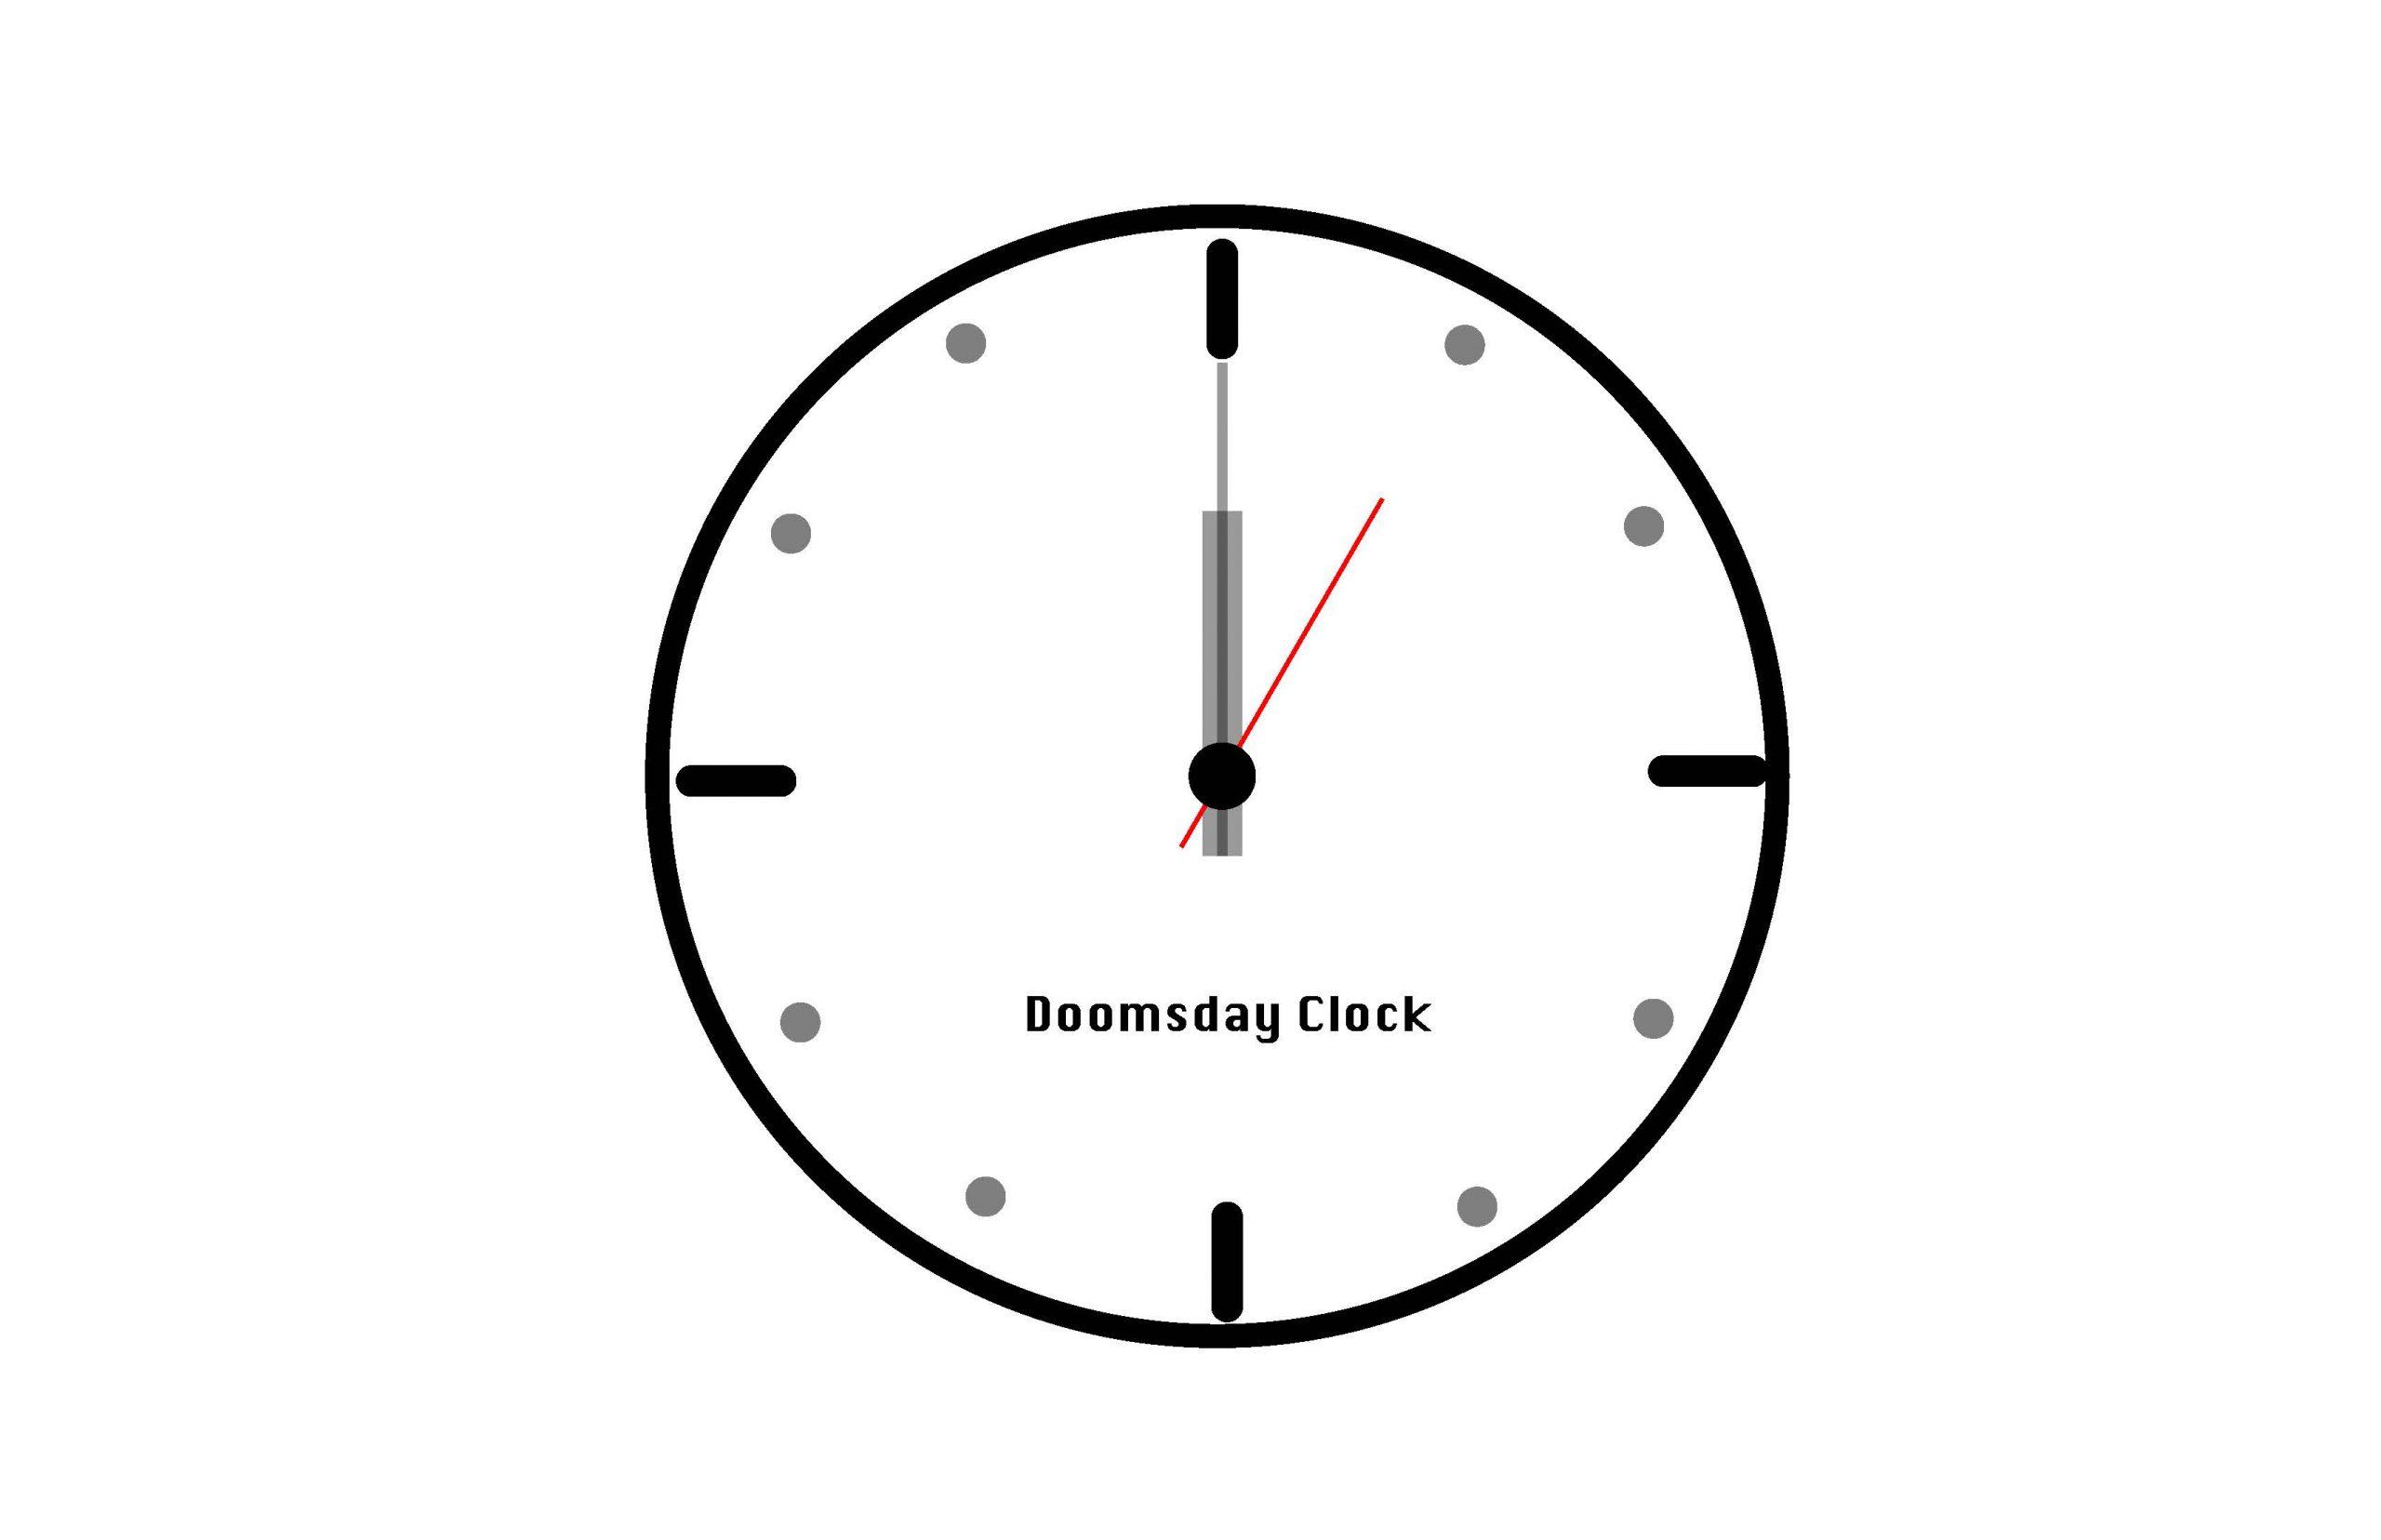 Hsiaoshan Lin - Doomsday Clock